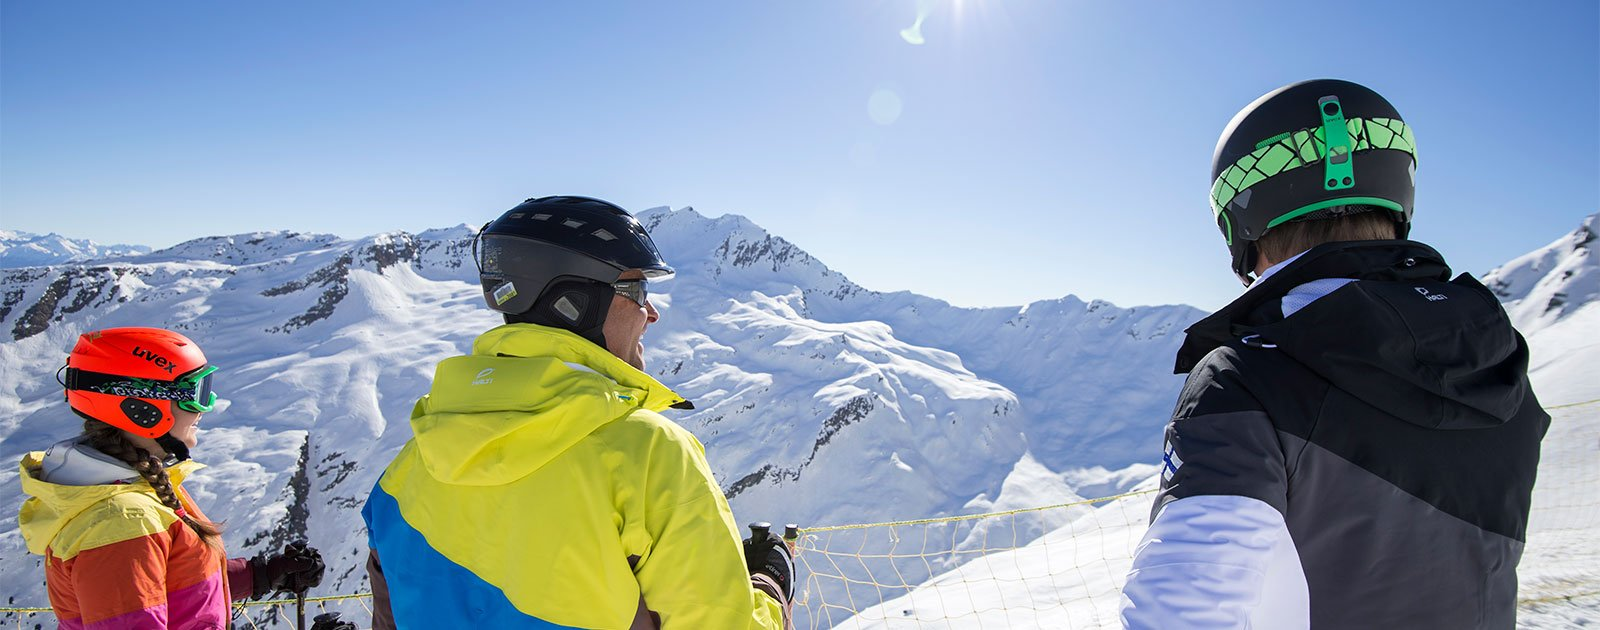 Skifahren in Pfelders